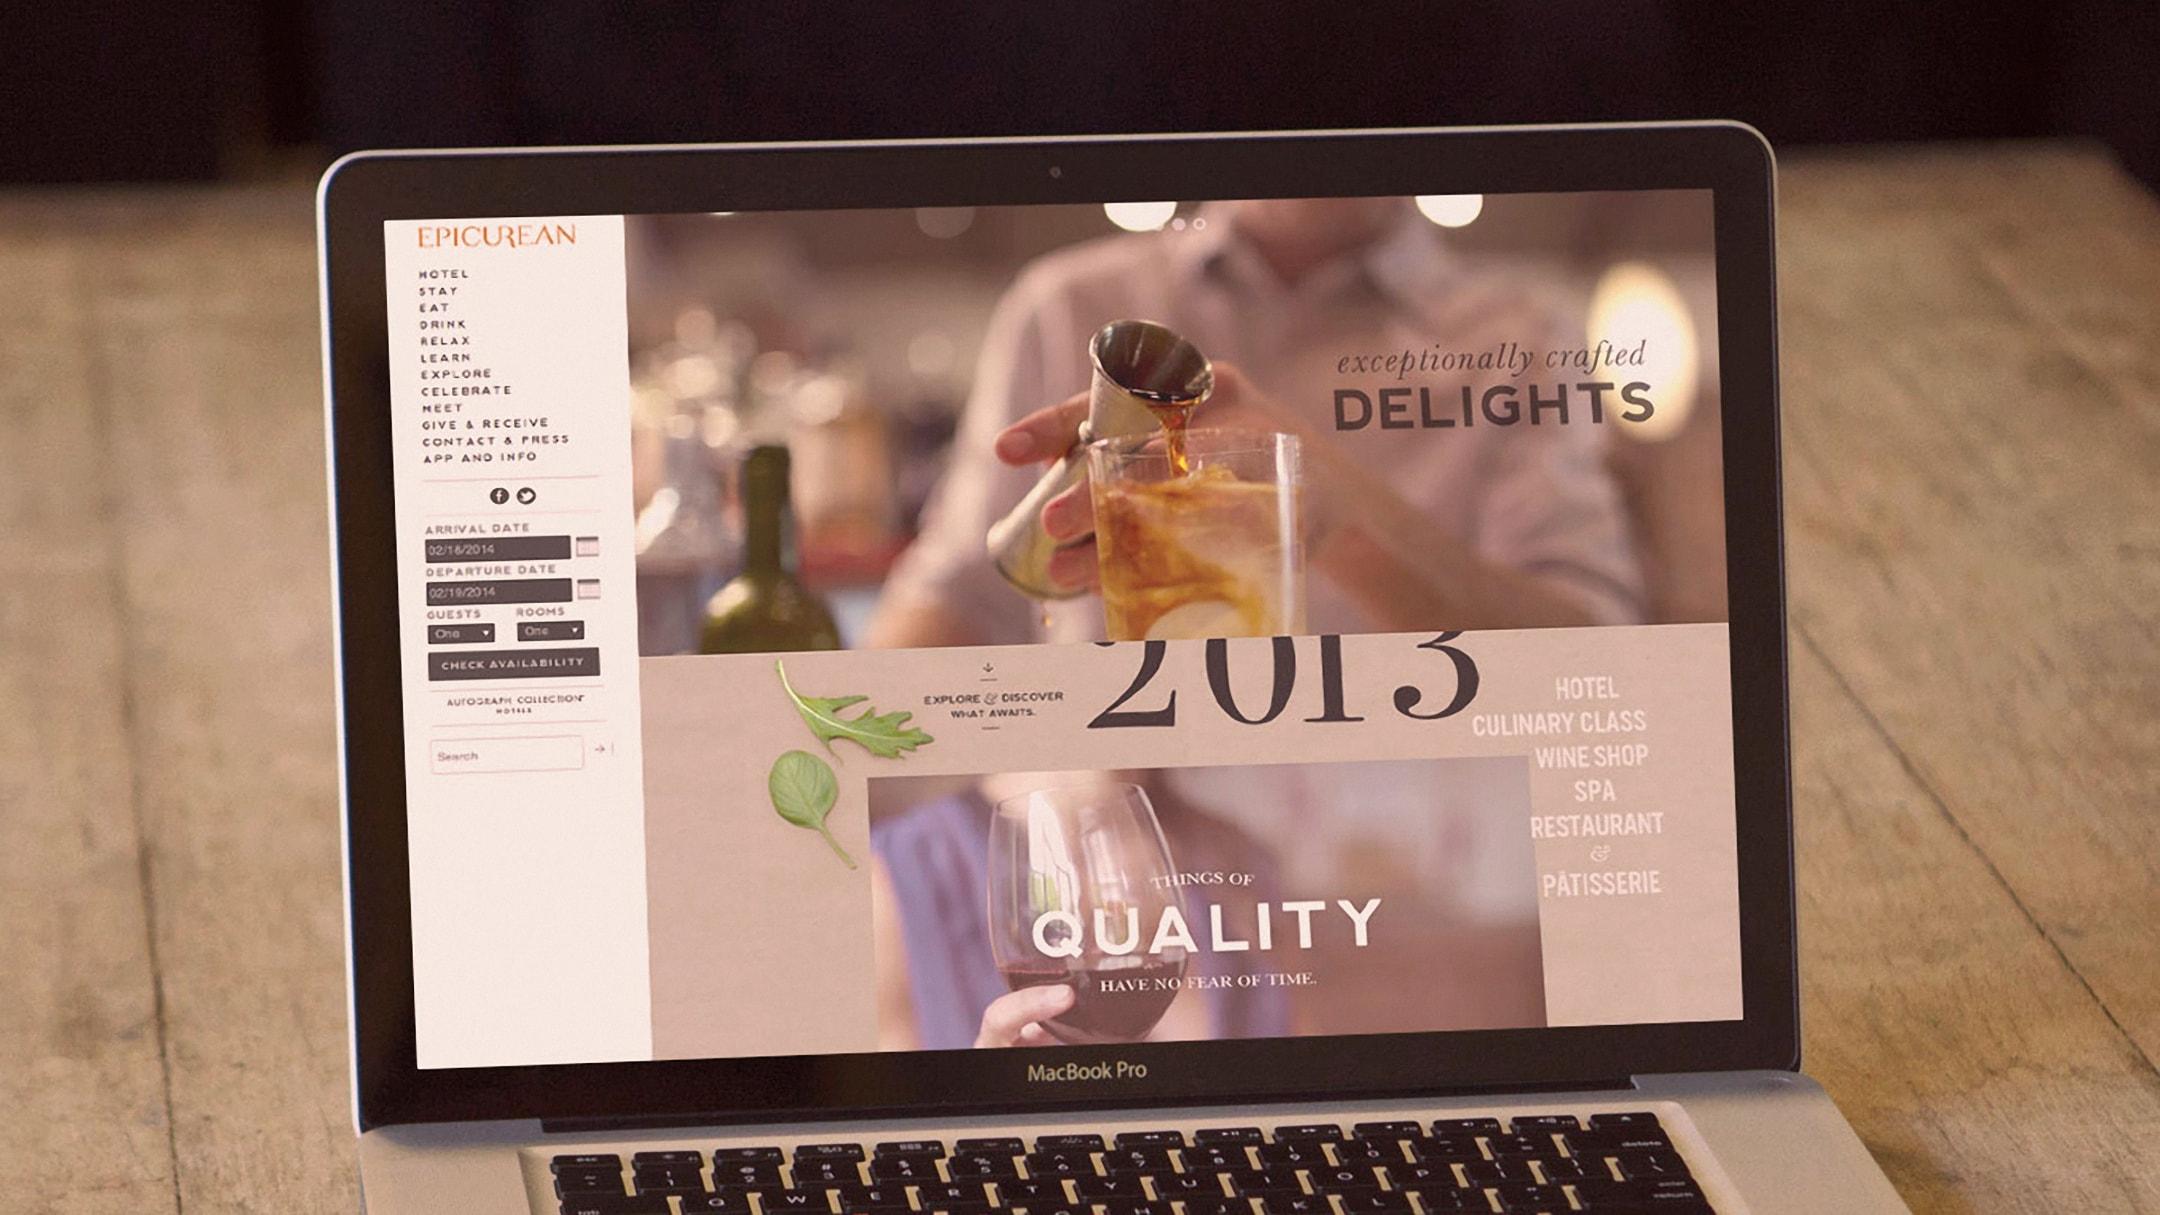 Epicurean Hotel website on laptop computer